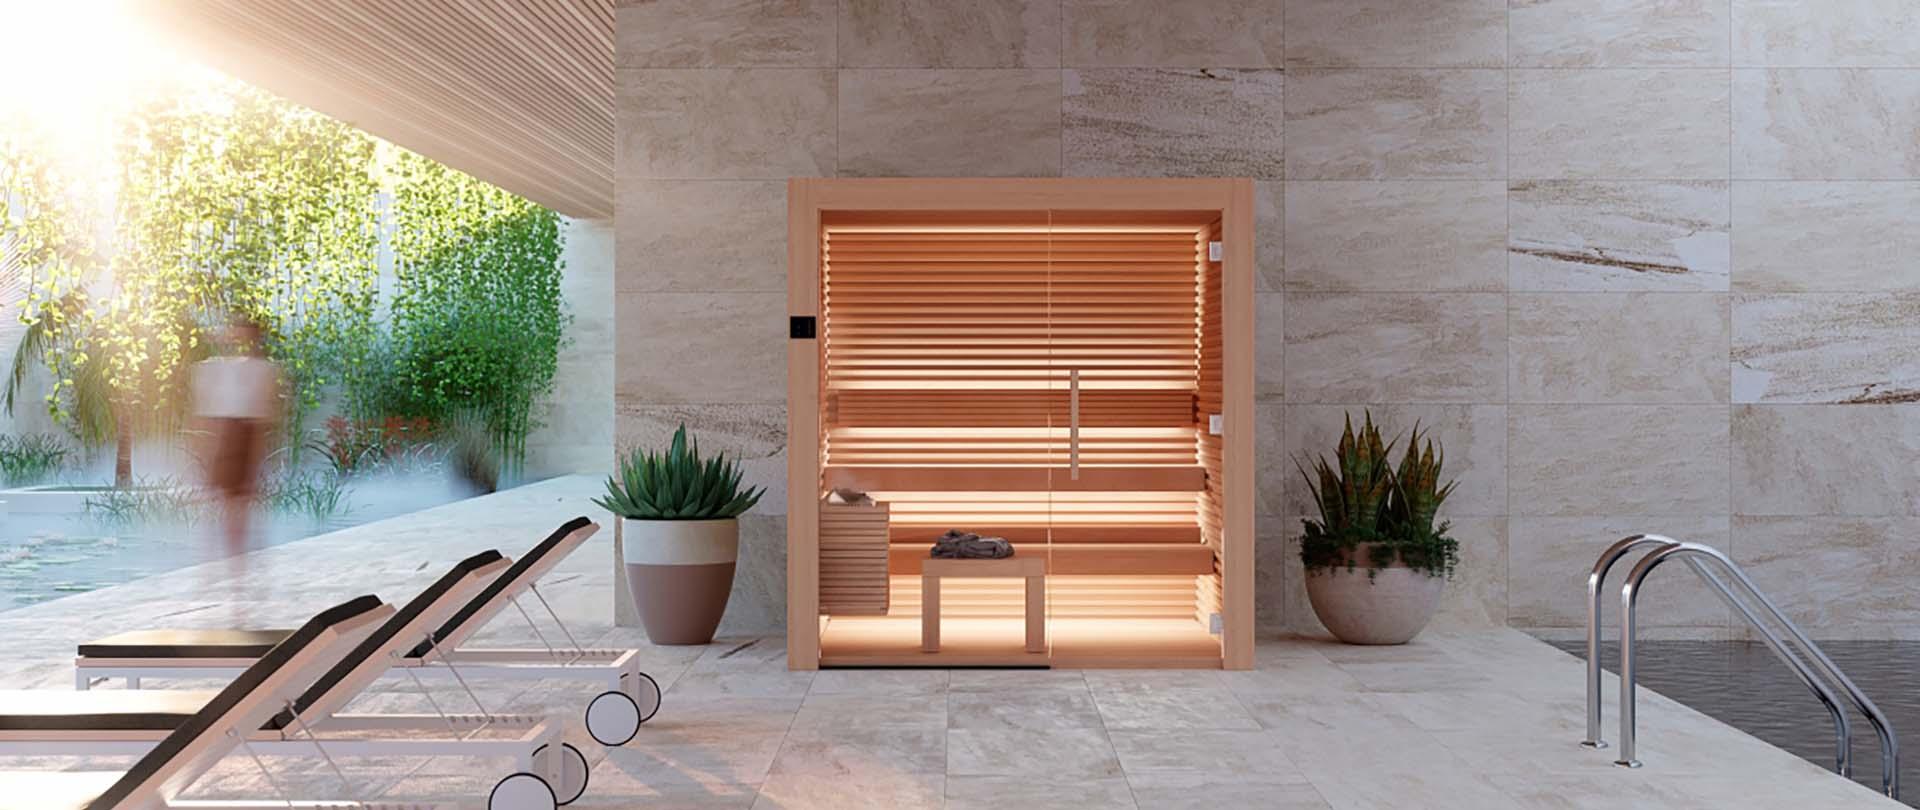 Sauna Interieur Bois Design Nativa Auroom Geneve Lausanne